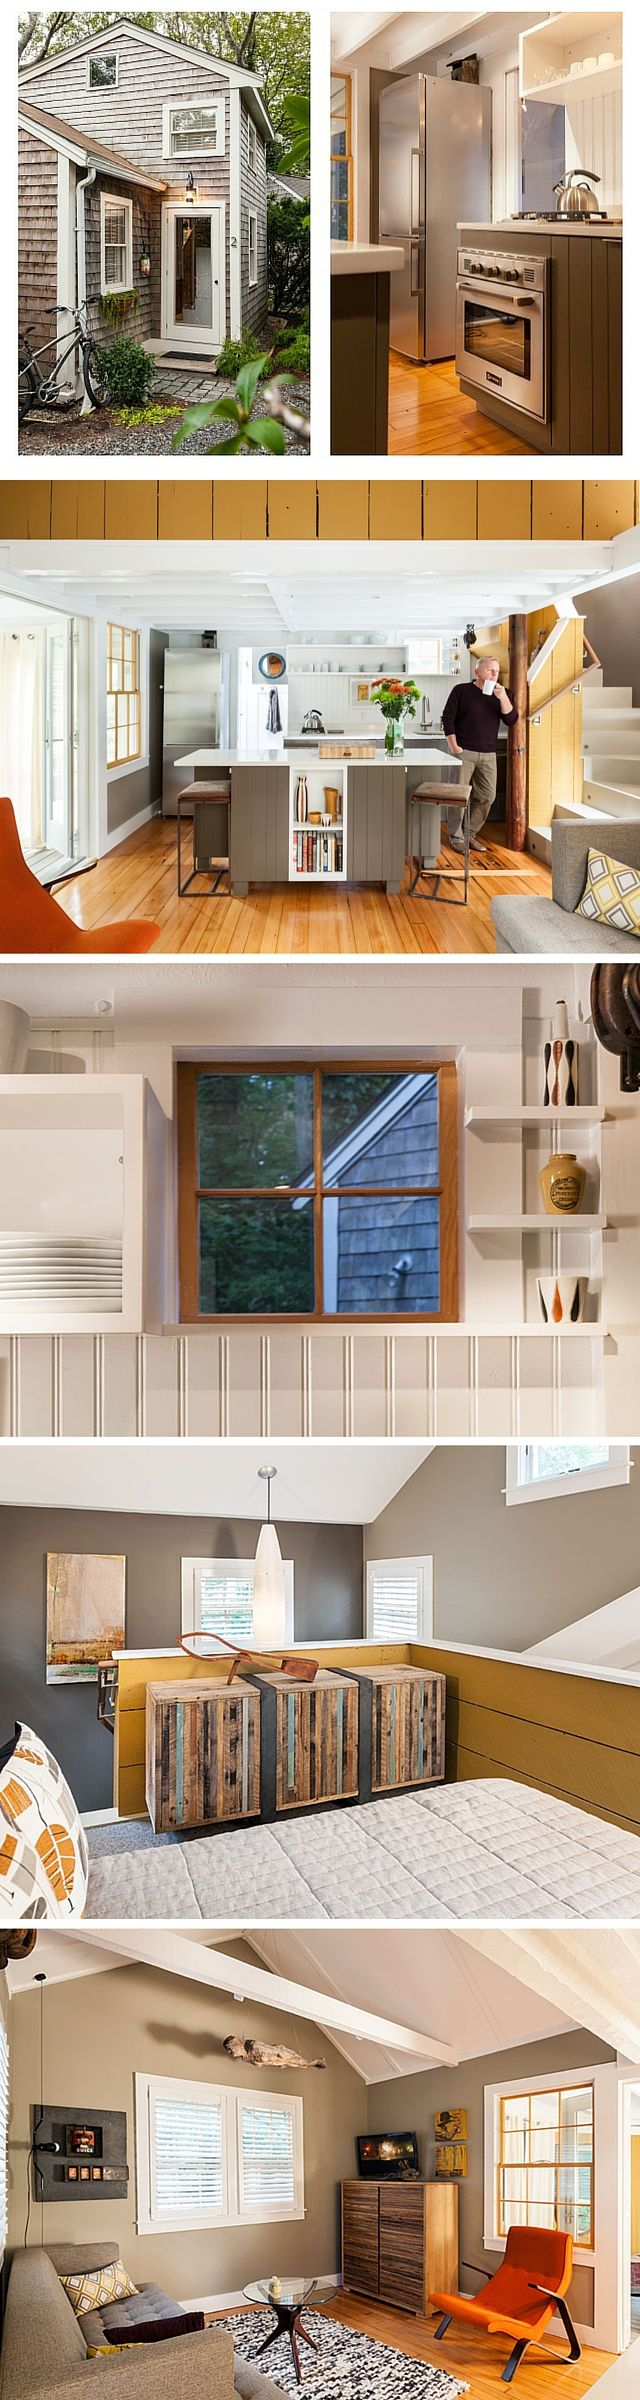 A 350 sq ft Cape Cod cottage